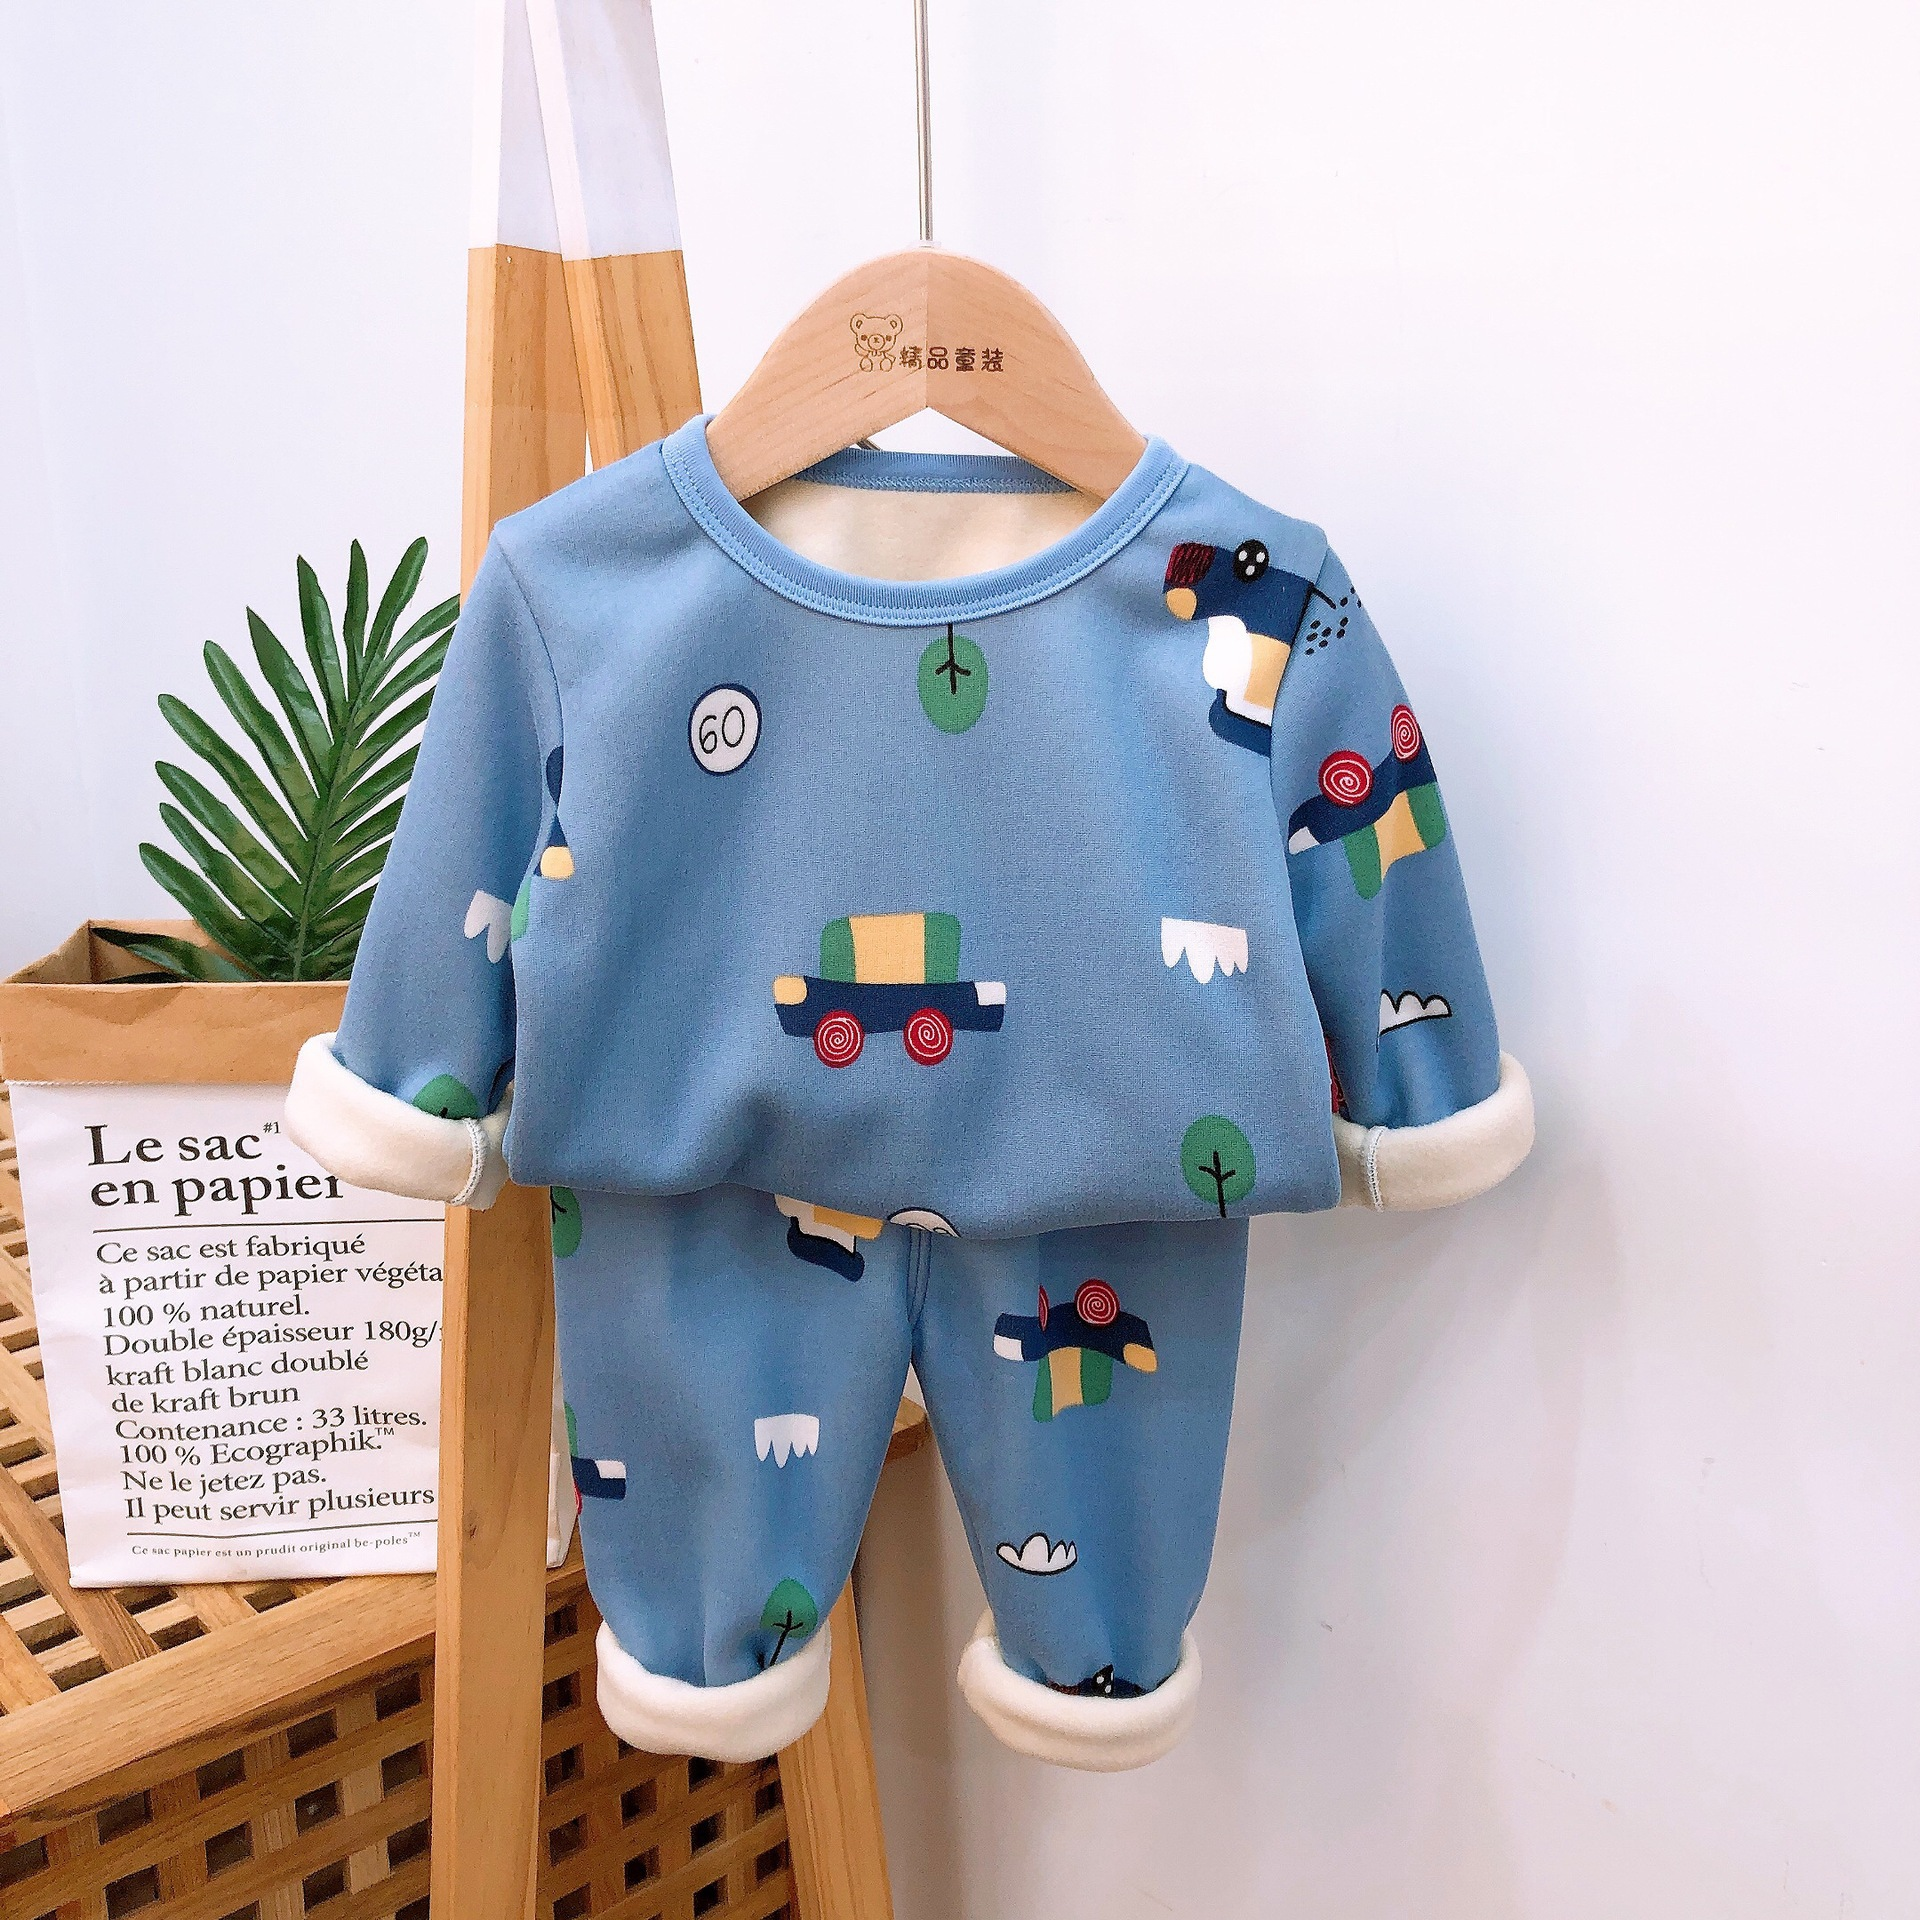 2020 Autumn Winter Thicken Velvet Children Pajamas Cartoon Family Boys Girls Clothing Set Kids Casual Sleepwear Suits Clothes 6